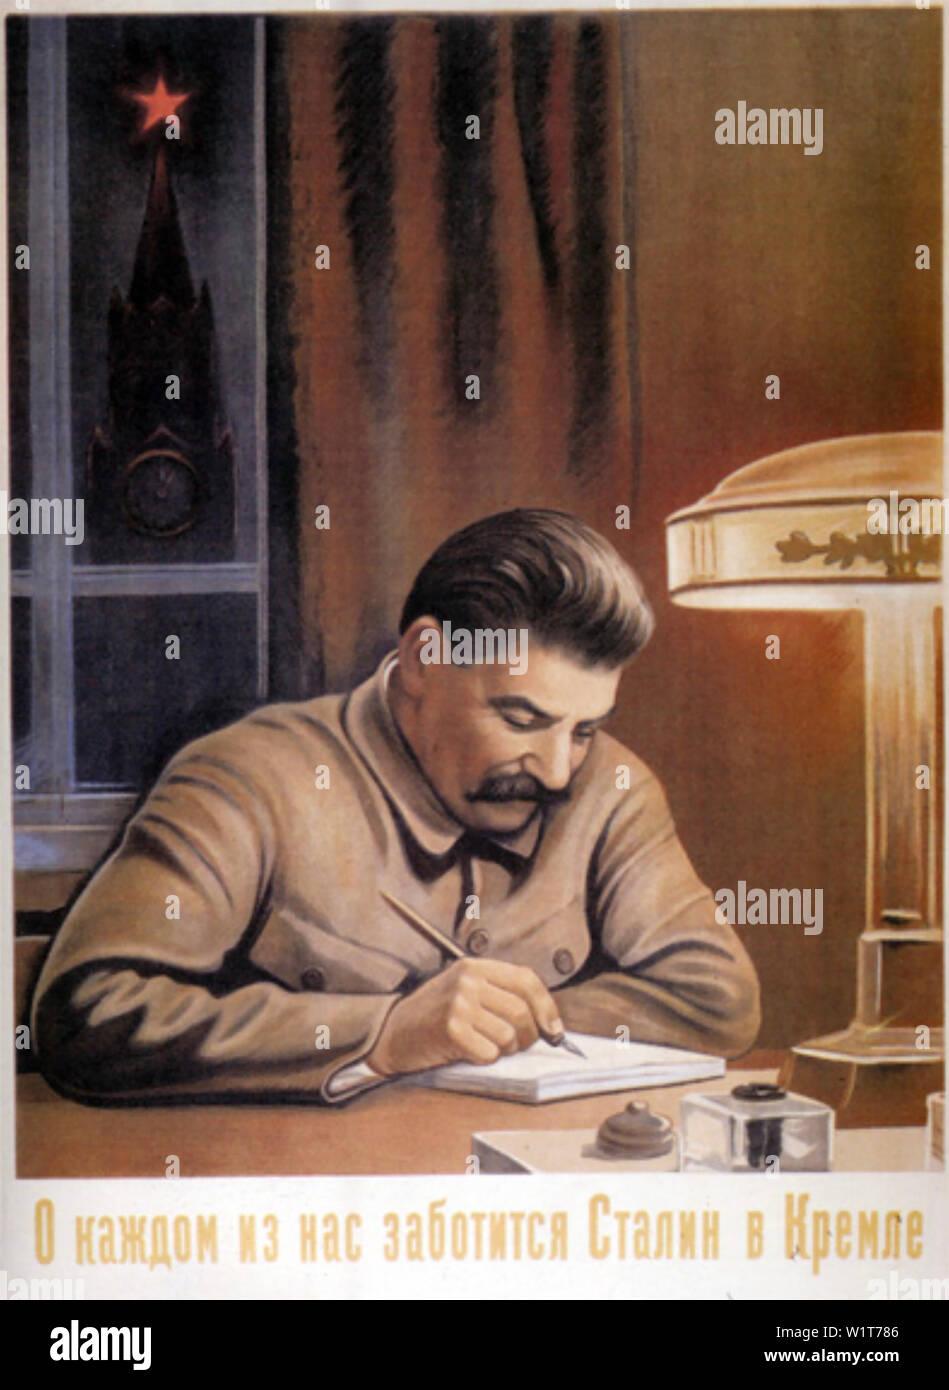 WORKING AT THE KREMLIN COMRADE STALIN THINKS OF EVERYONE 1940 Soviet poster - Stock Image